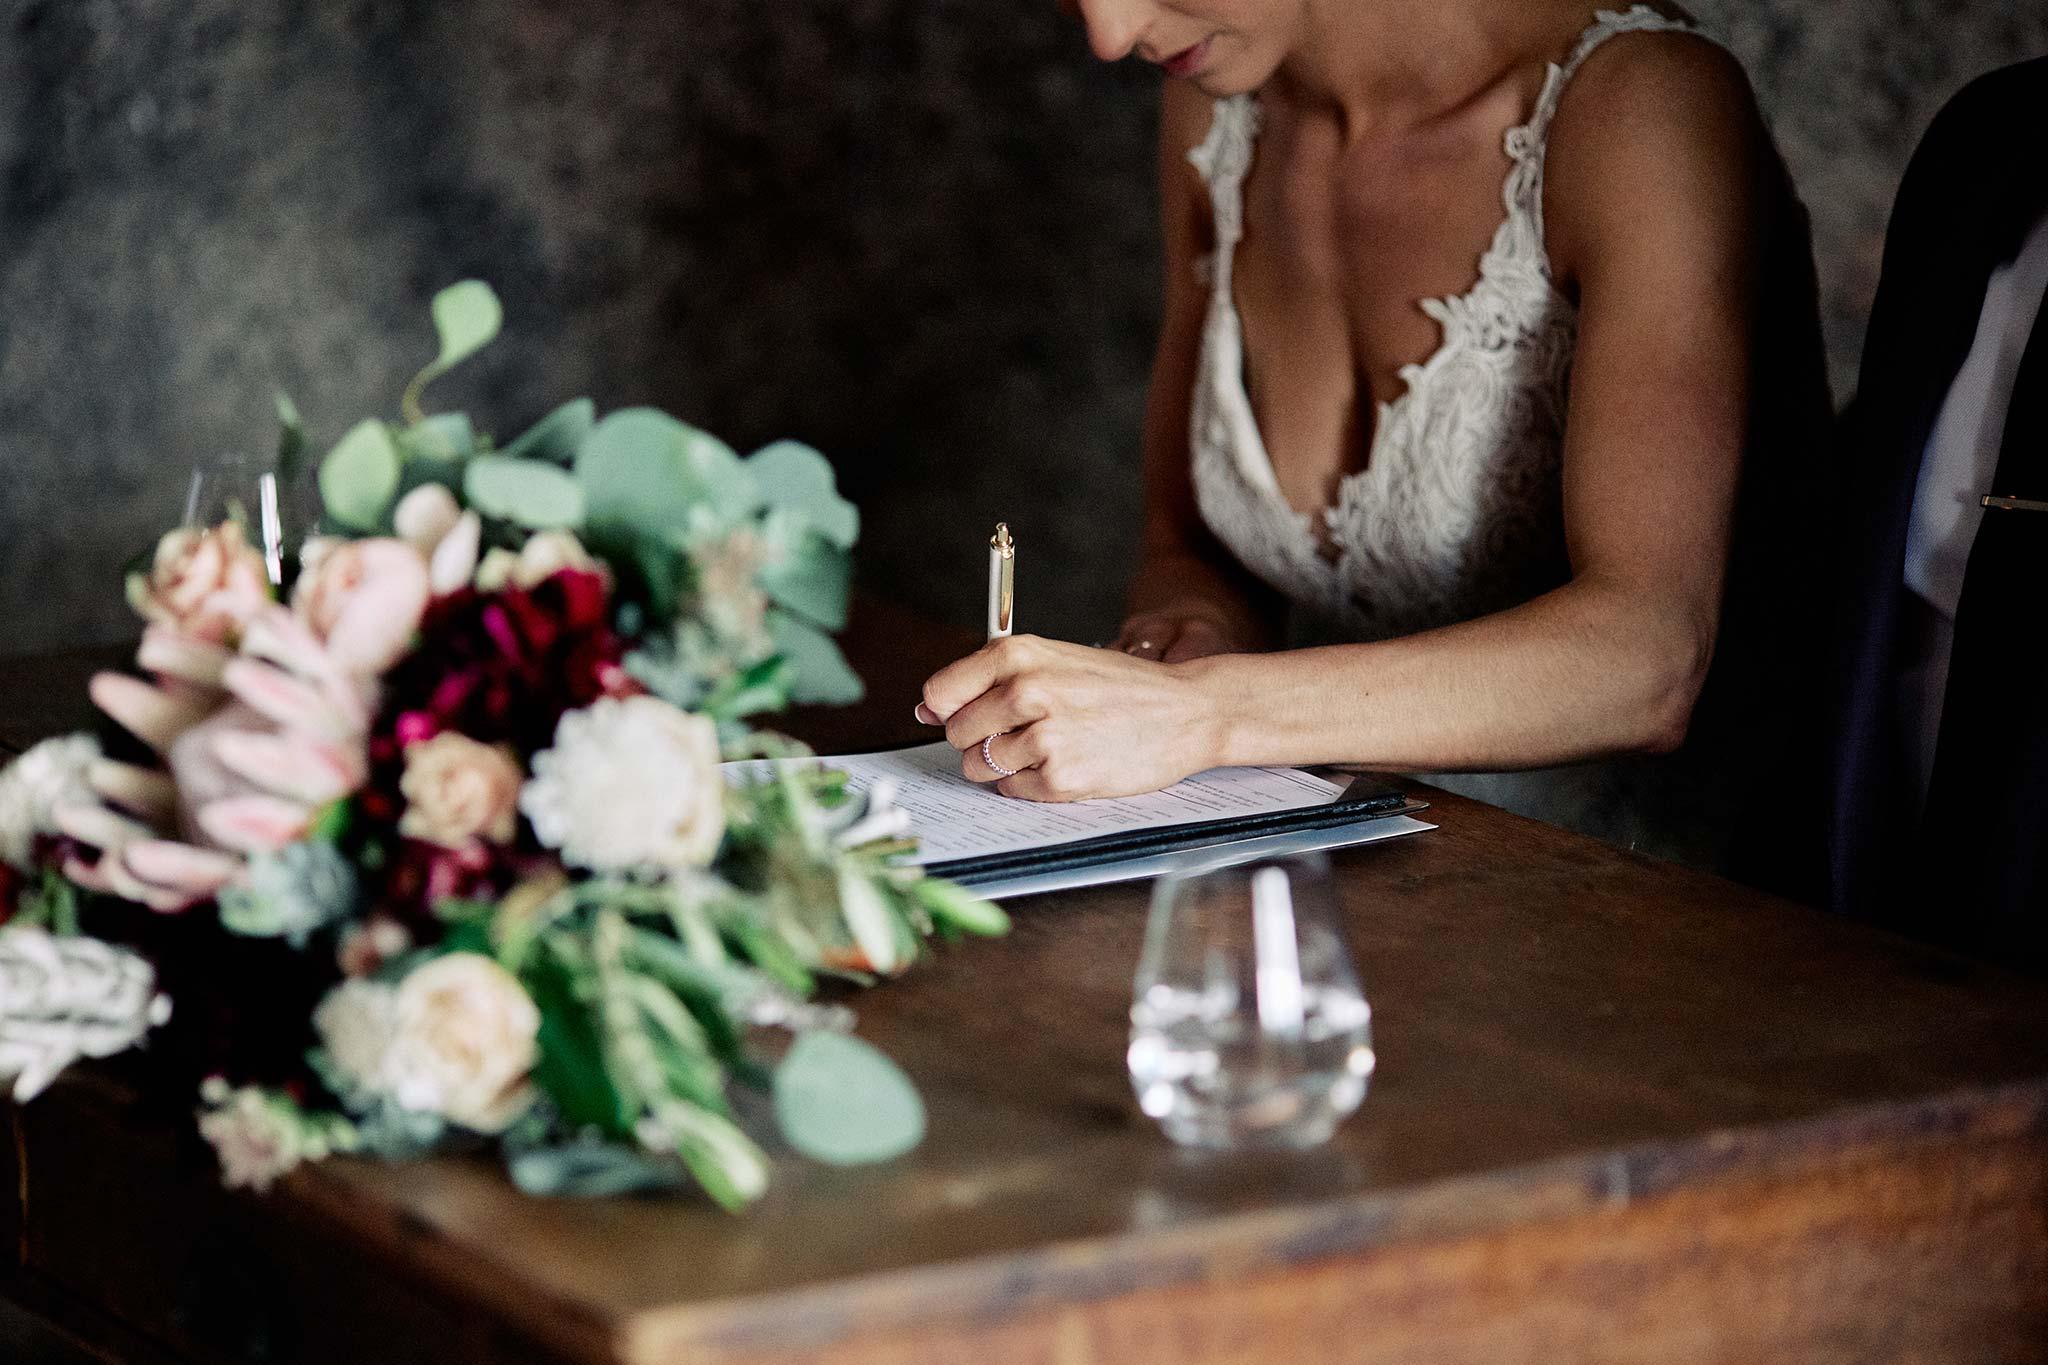 Zonzo estate wedding ceremony signging of paper